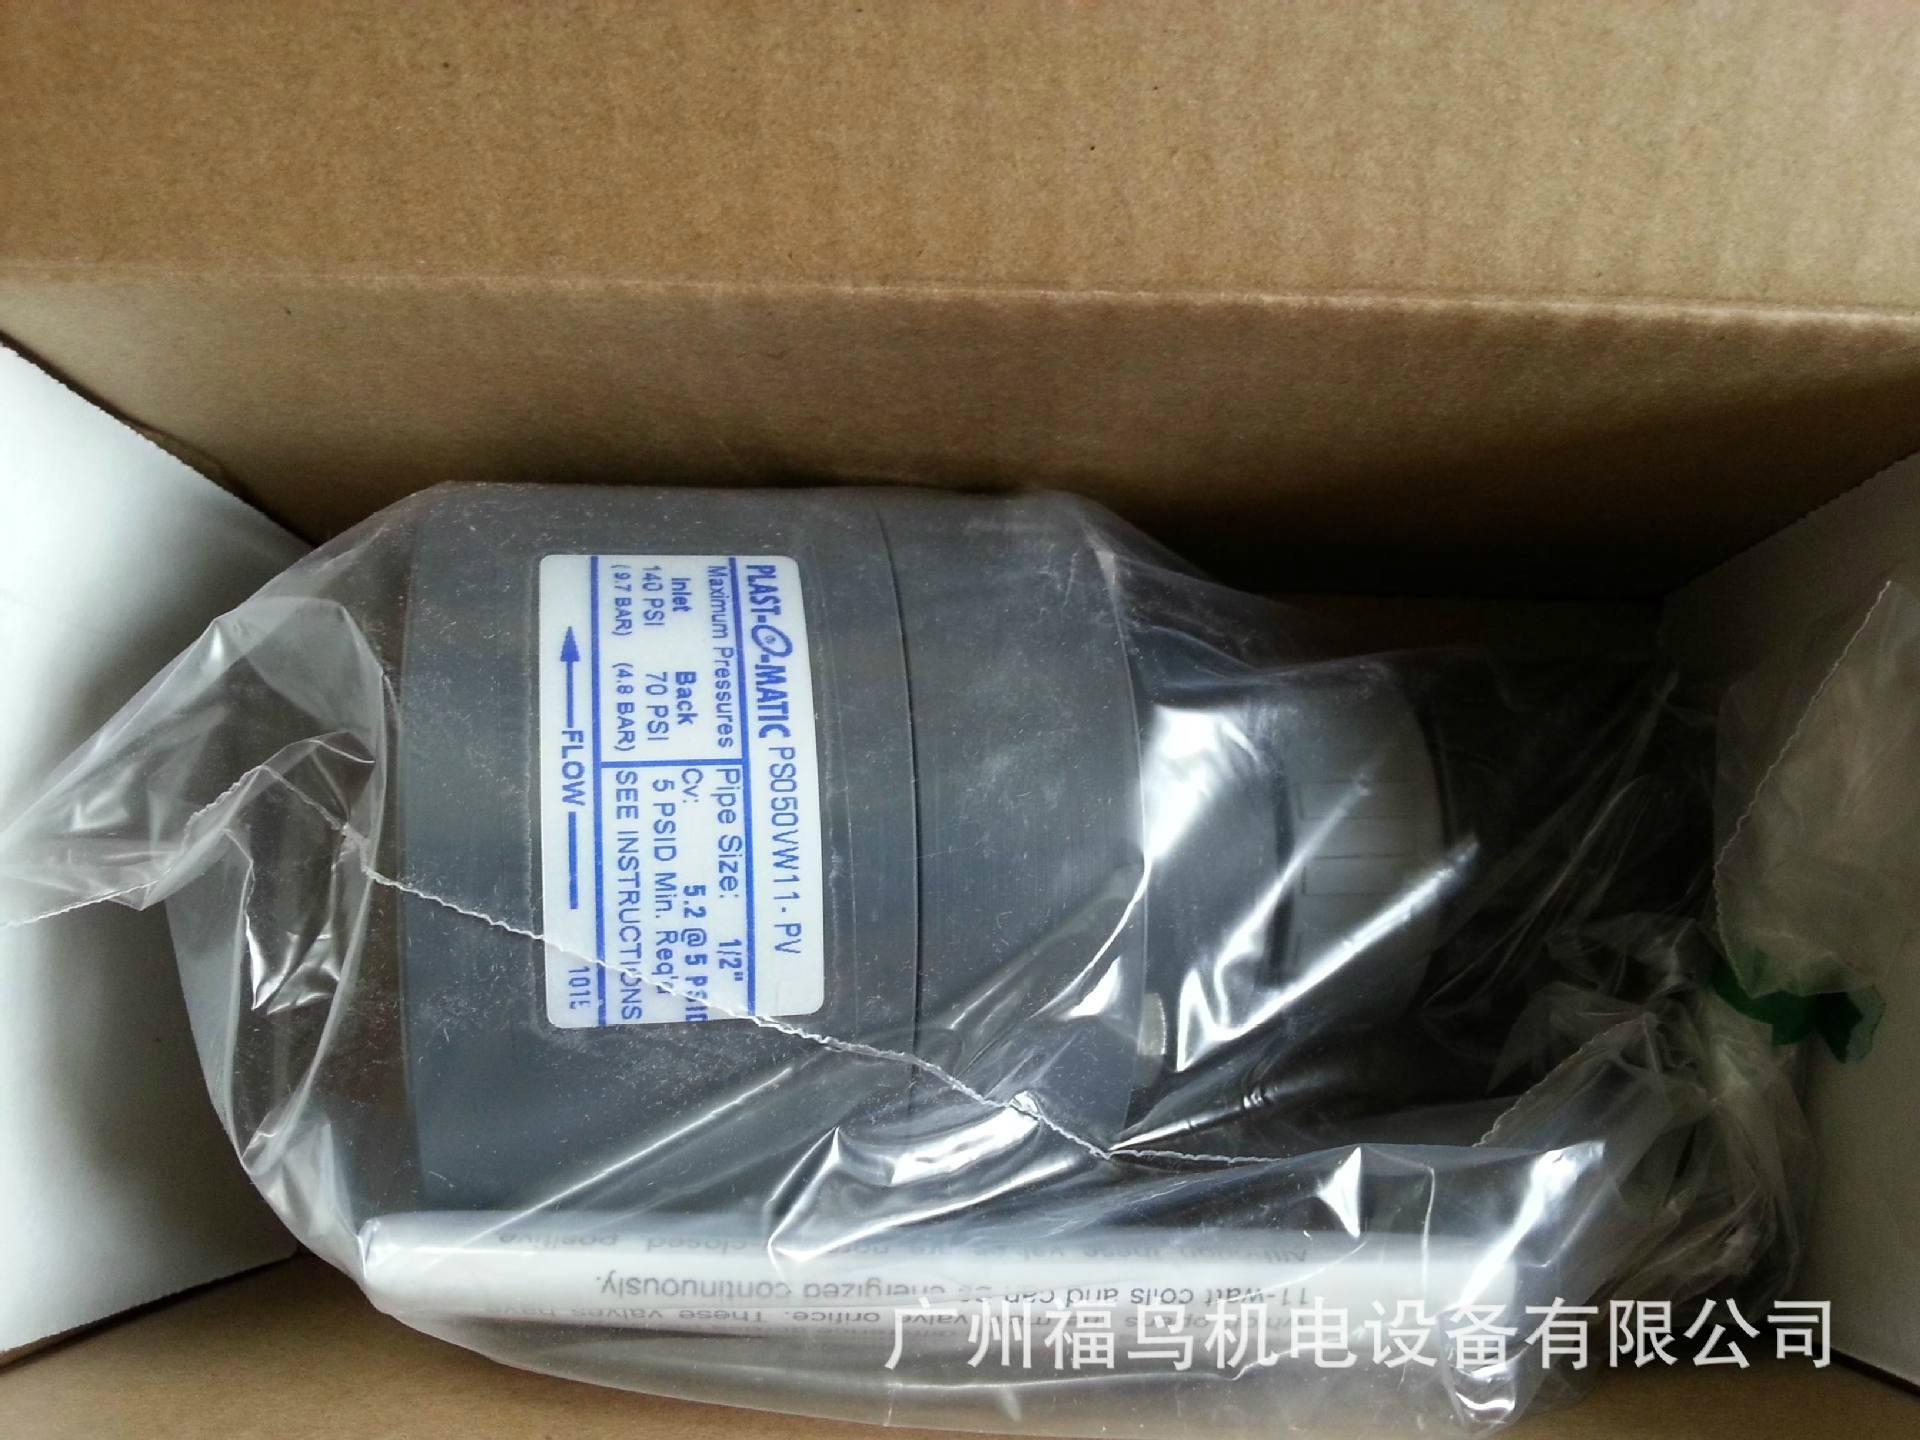 PLAST-O-MATIC電磁閥, 型號: PS050VW11-PV